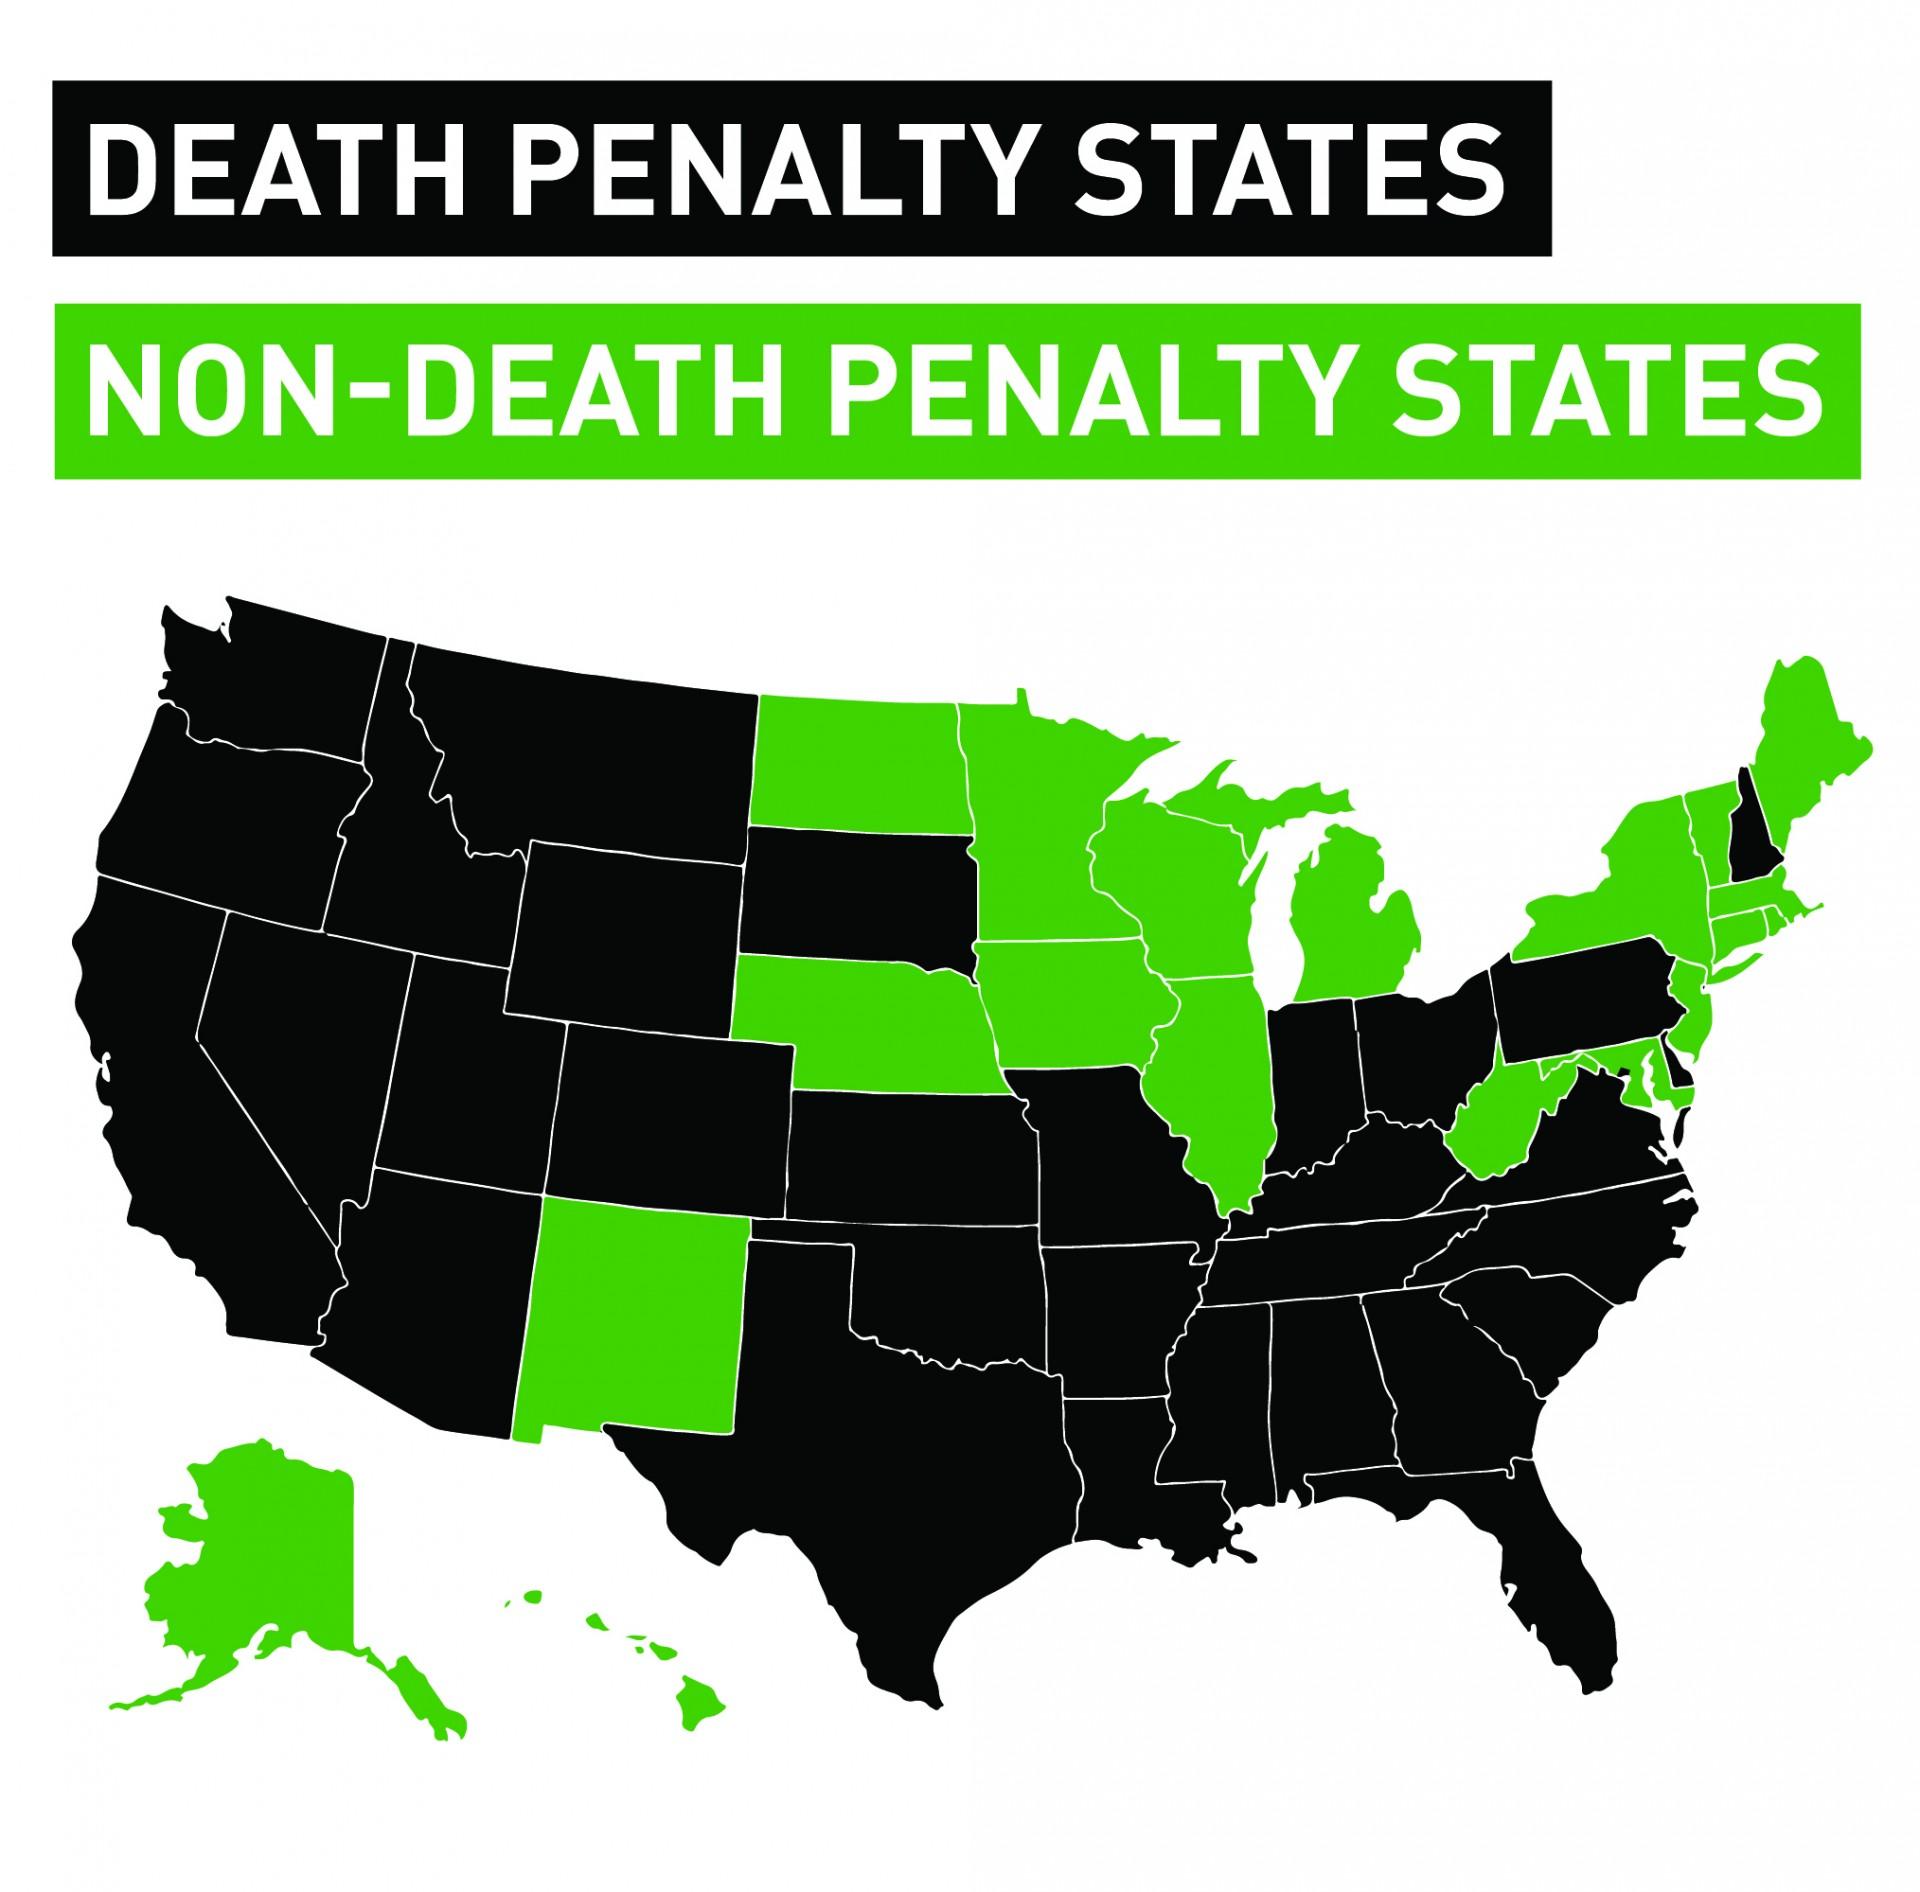 Discursive essay on capital punishment